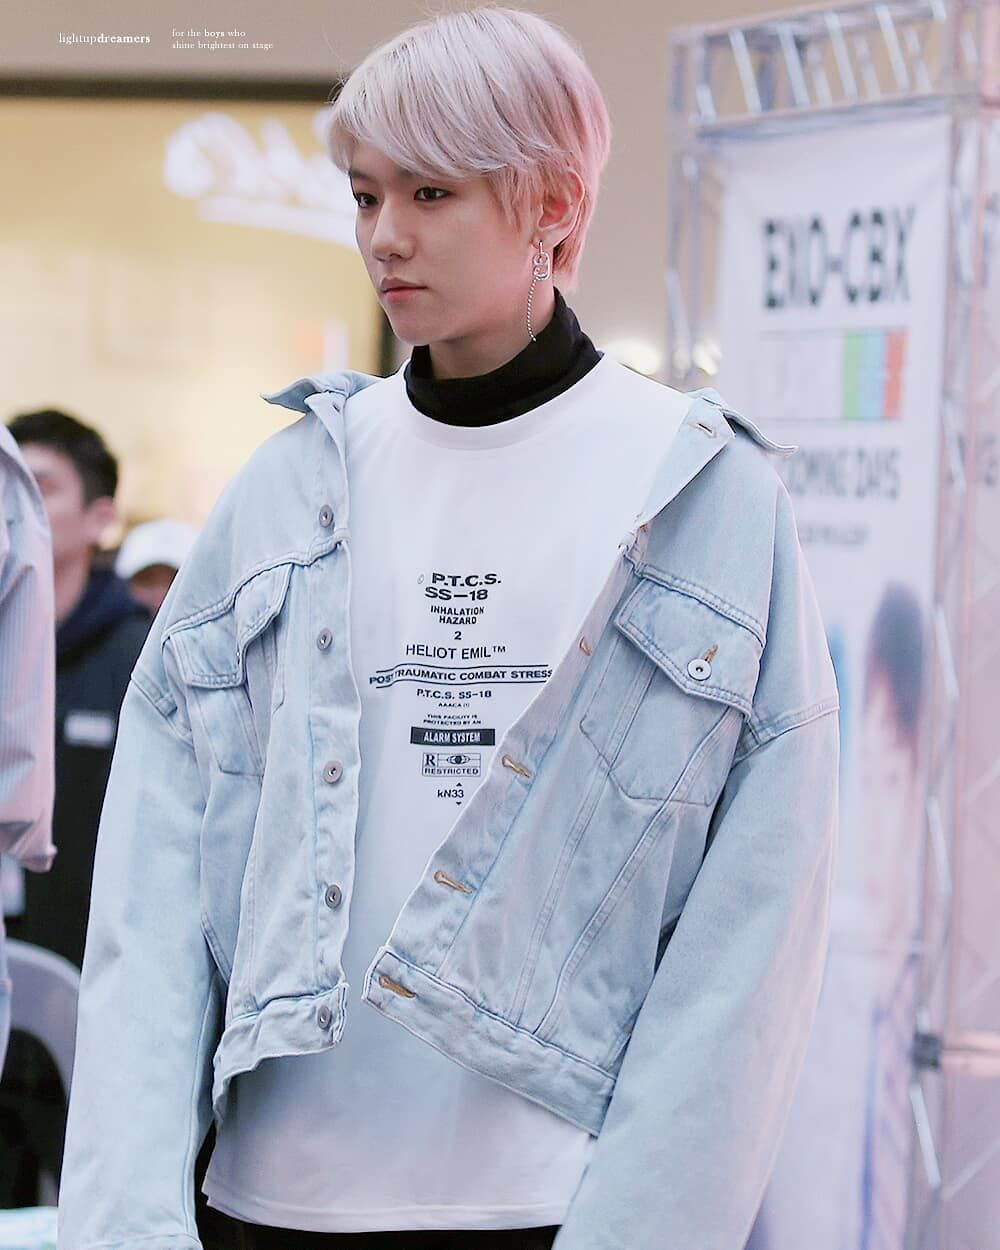 Most Handsome K-Pop Male Idols | EXO | Baekhyun (Byun Baek